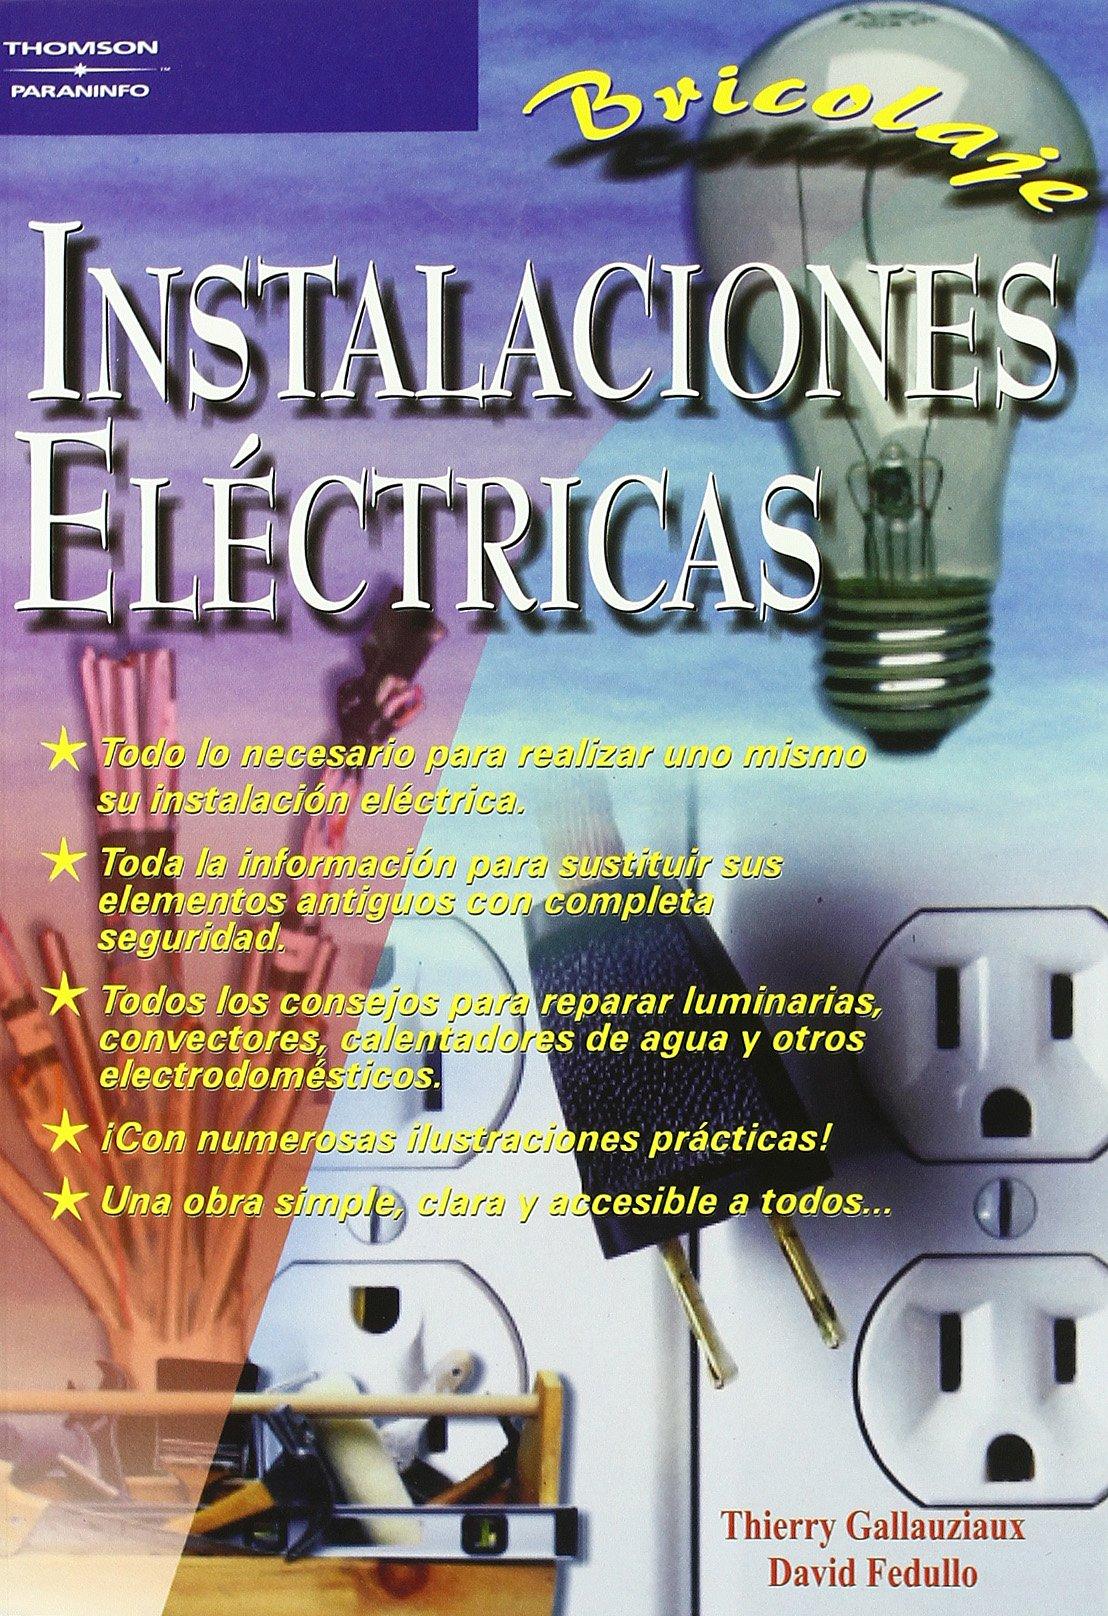 Instalaciones Electricas - Bricolaje (Spanish Edition): Thierry Gallauziaux: 9788428328180: Amazon.com: Books